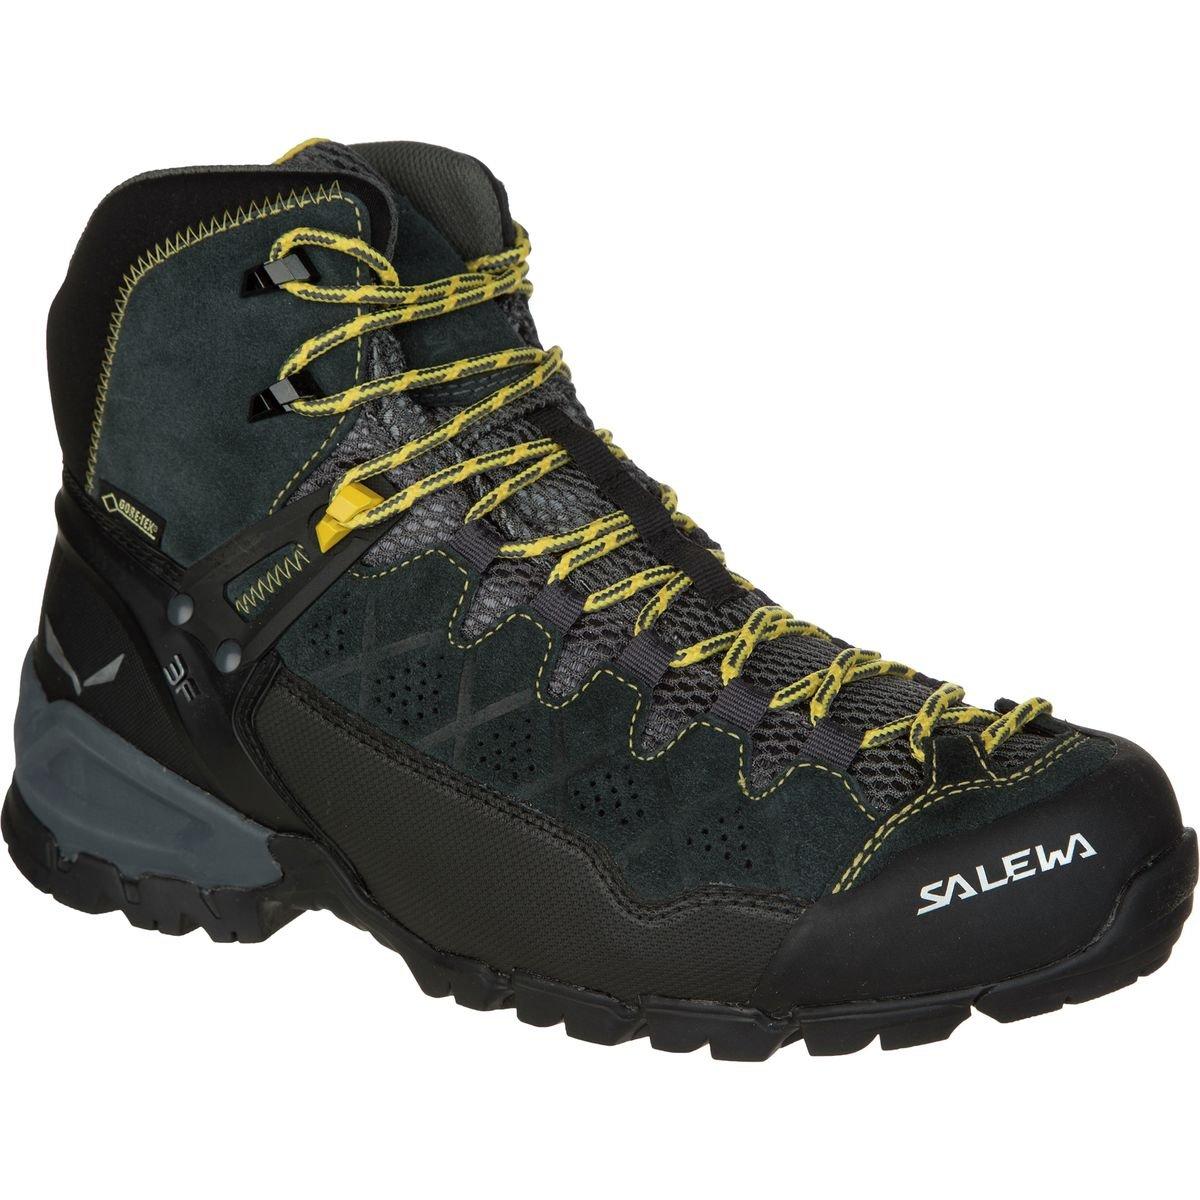 Salewa Men's ALP Trainer Mid GTX Alpine Trekking Boot, Carbon/Ringlo, 13 D US